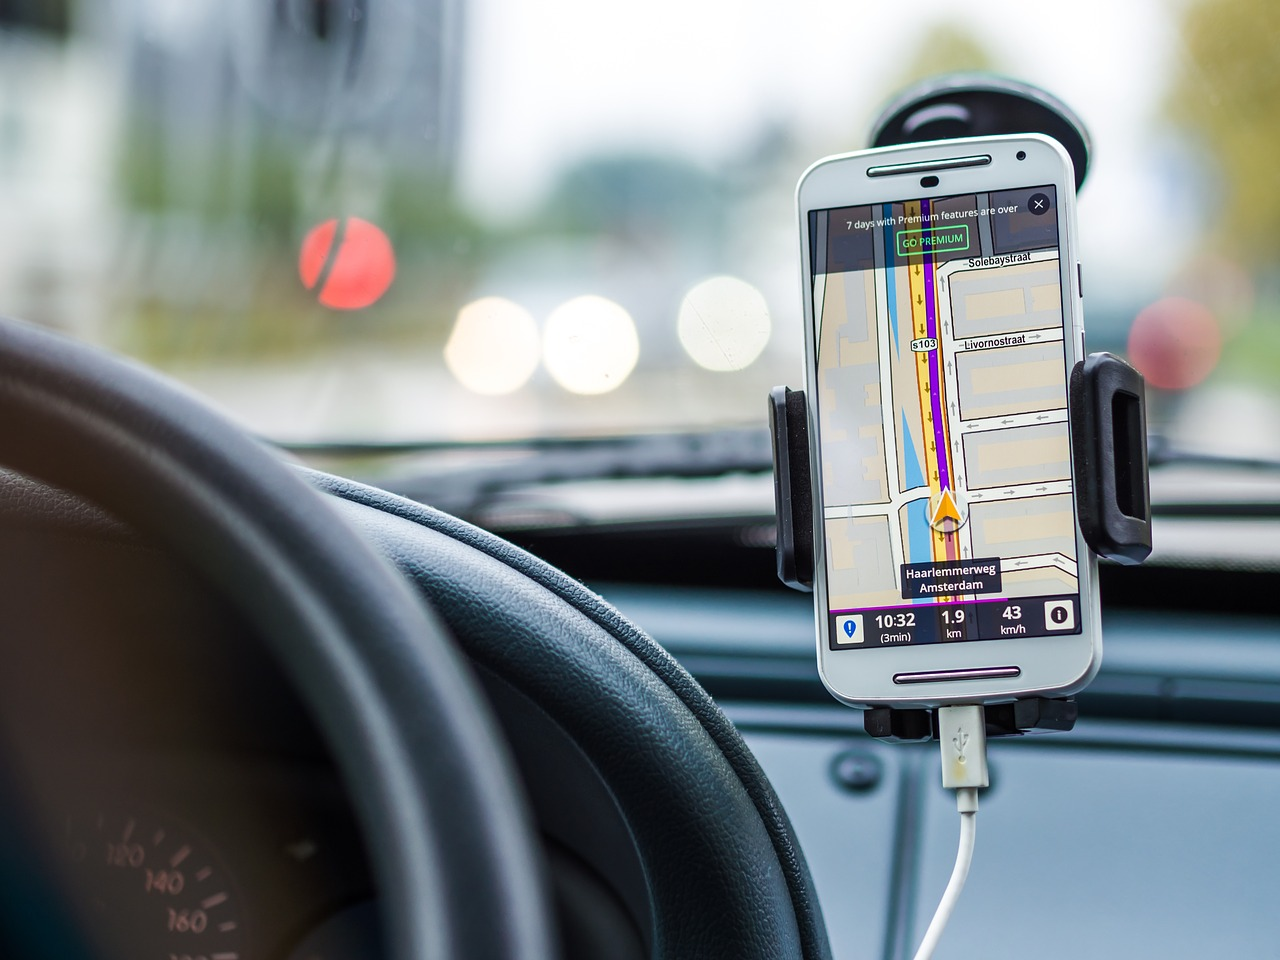 gps sur smartphone en voiture